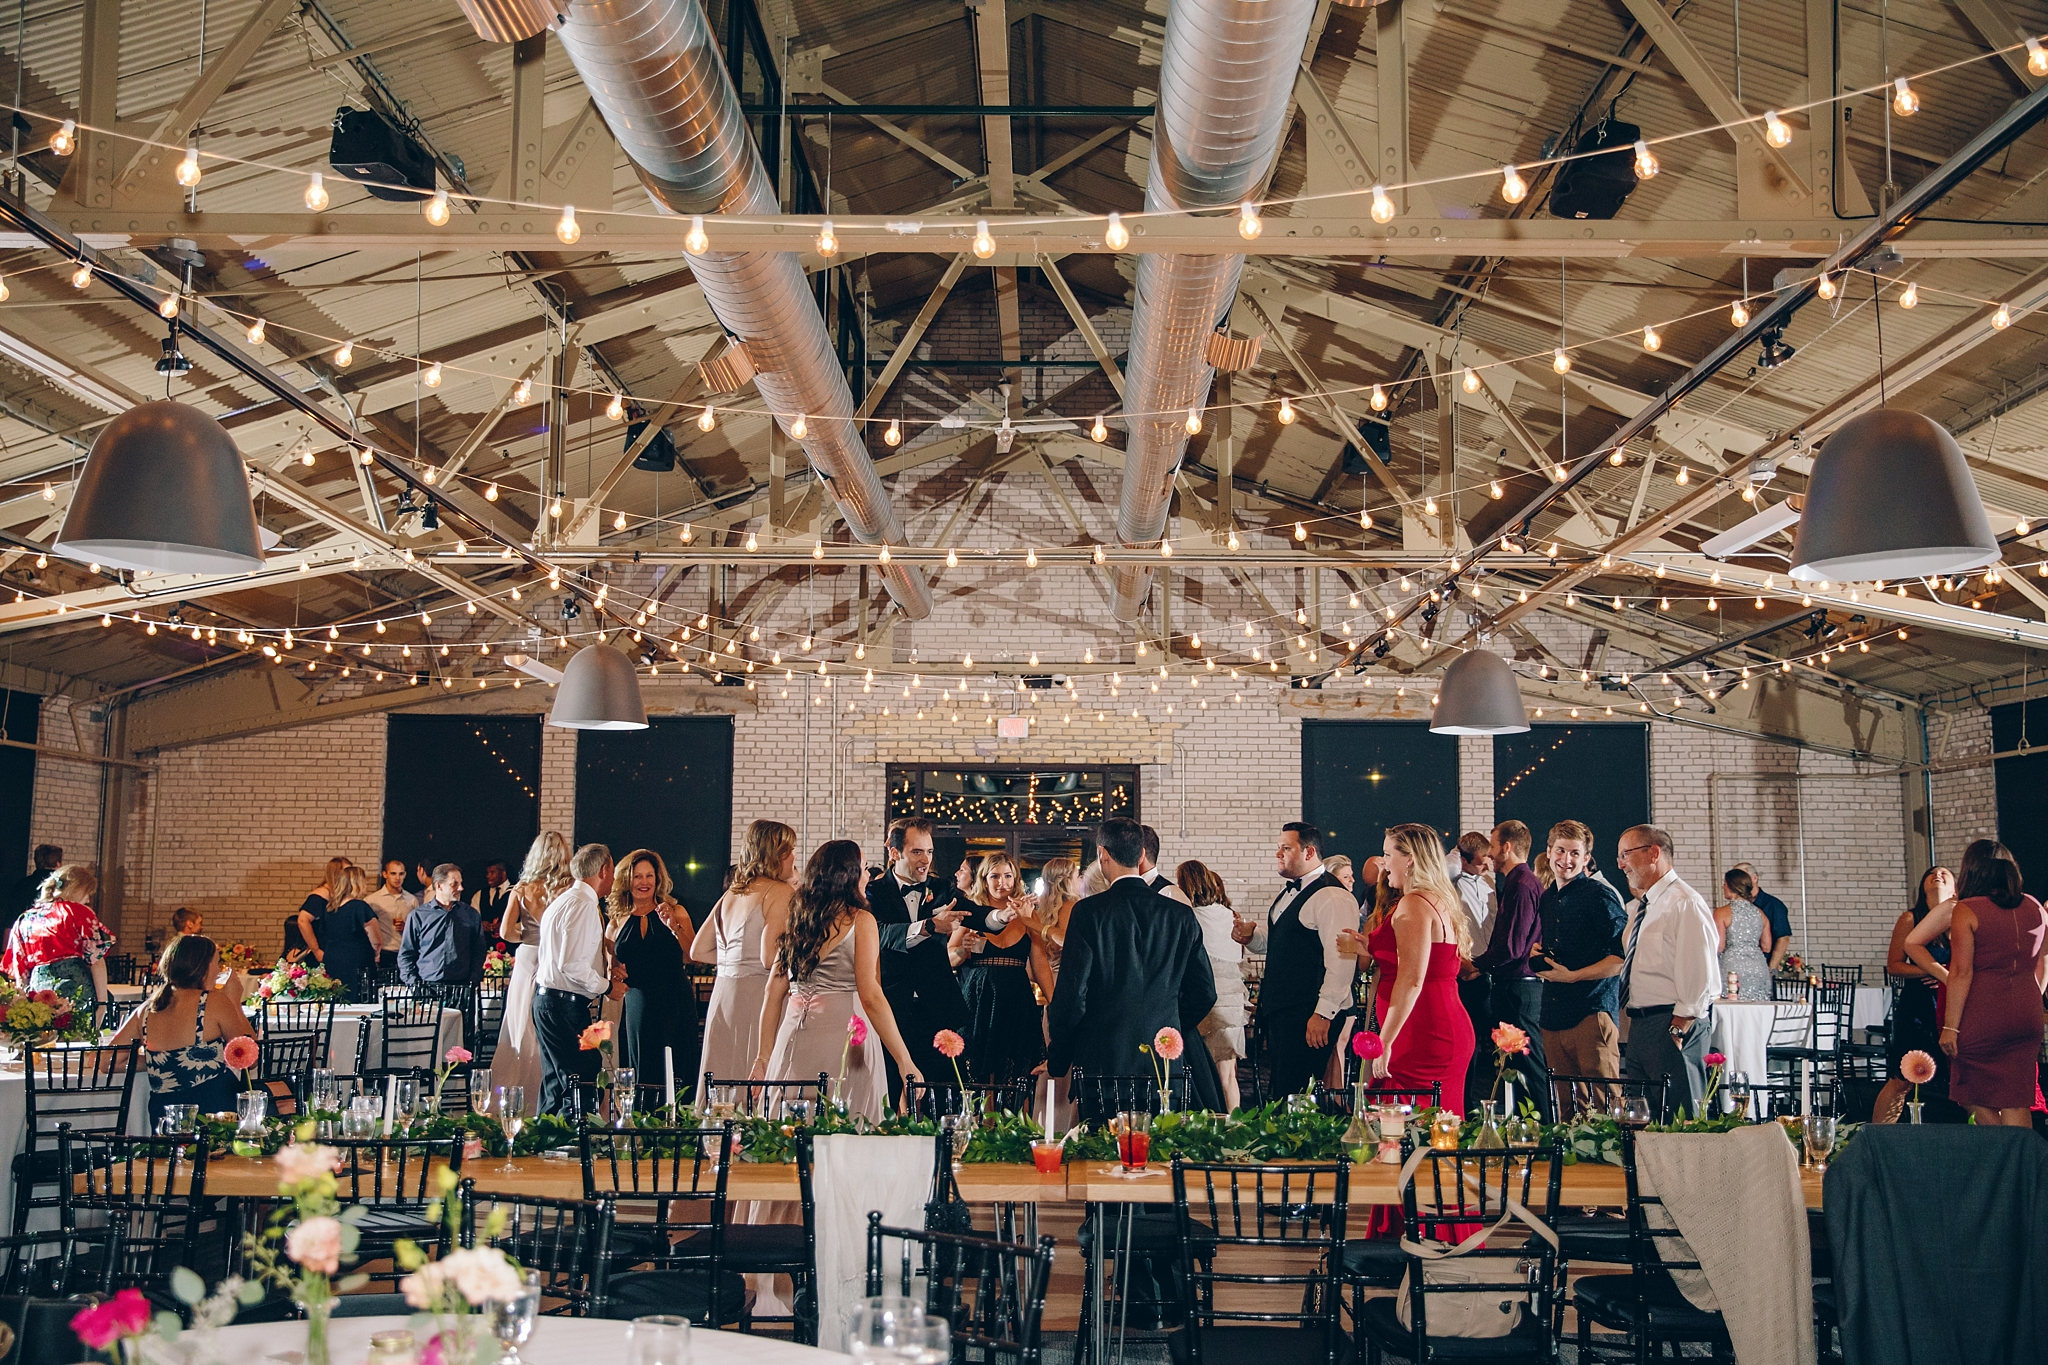 baker-lofts-holland-michigan-wedding-photographer_0408.jpg